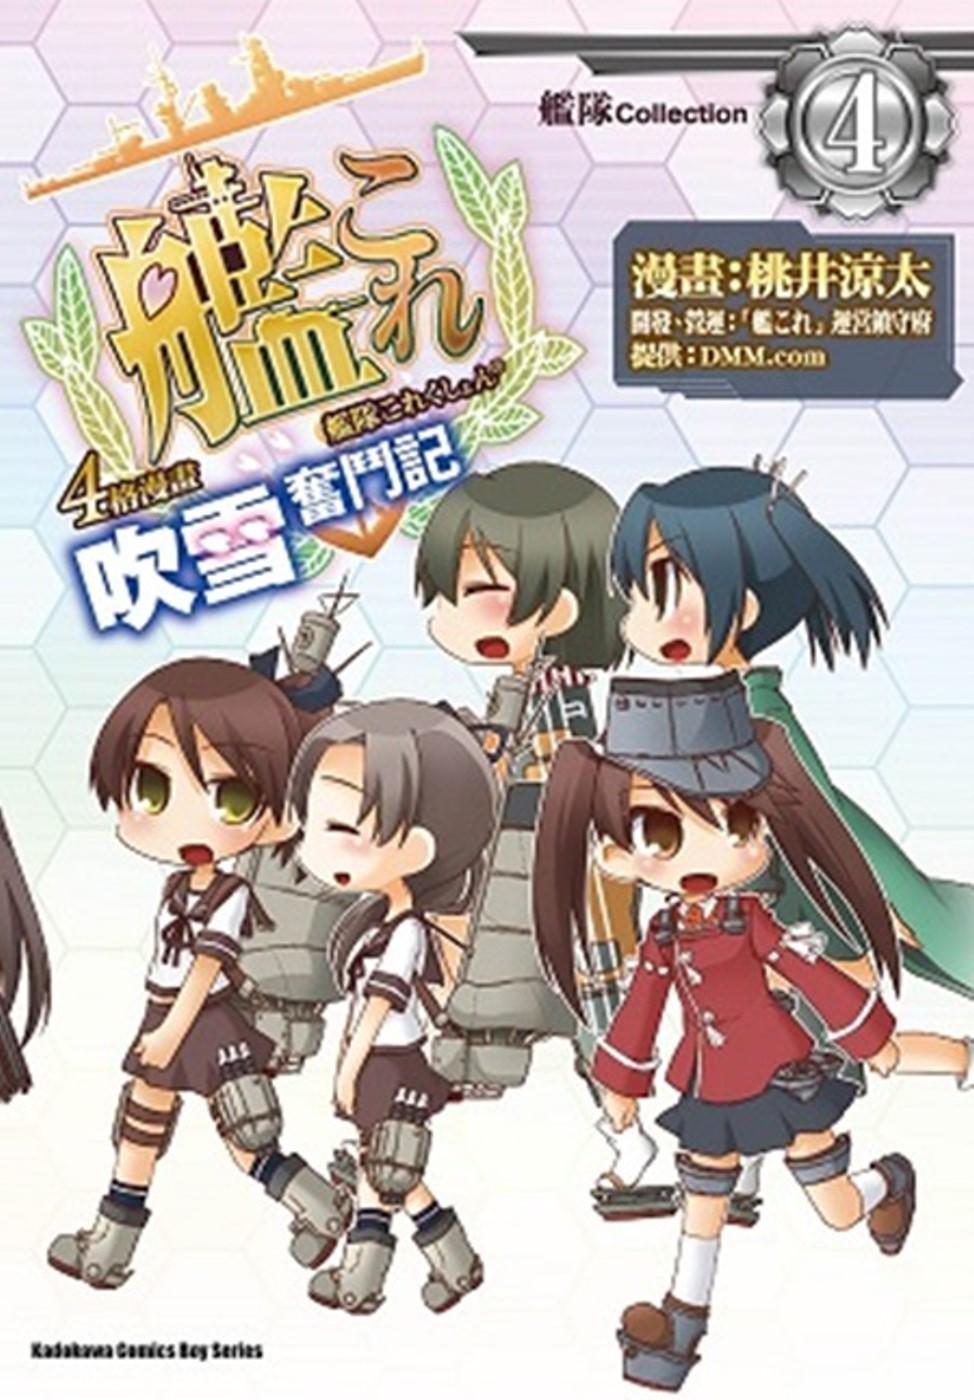 艦隊Collection 4格漫畫 吹雪奮鬥記 04